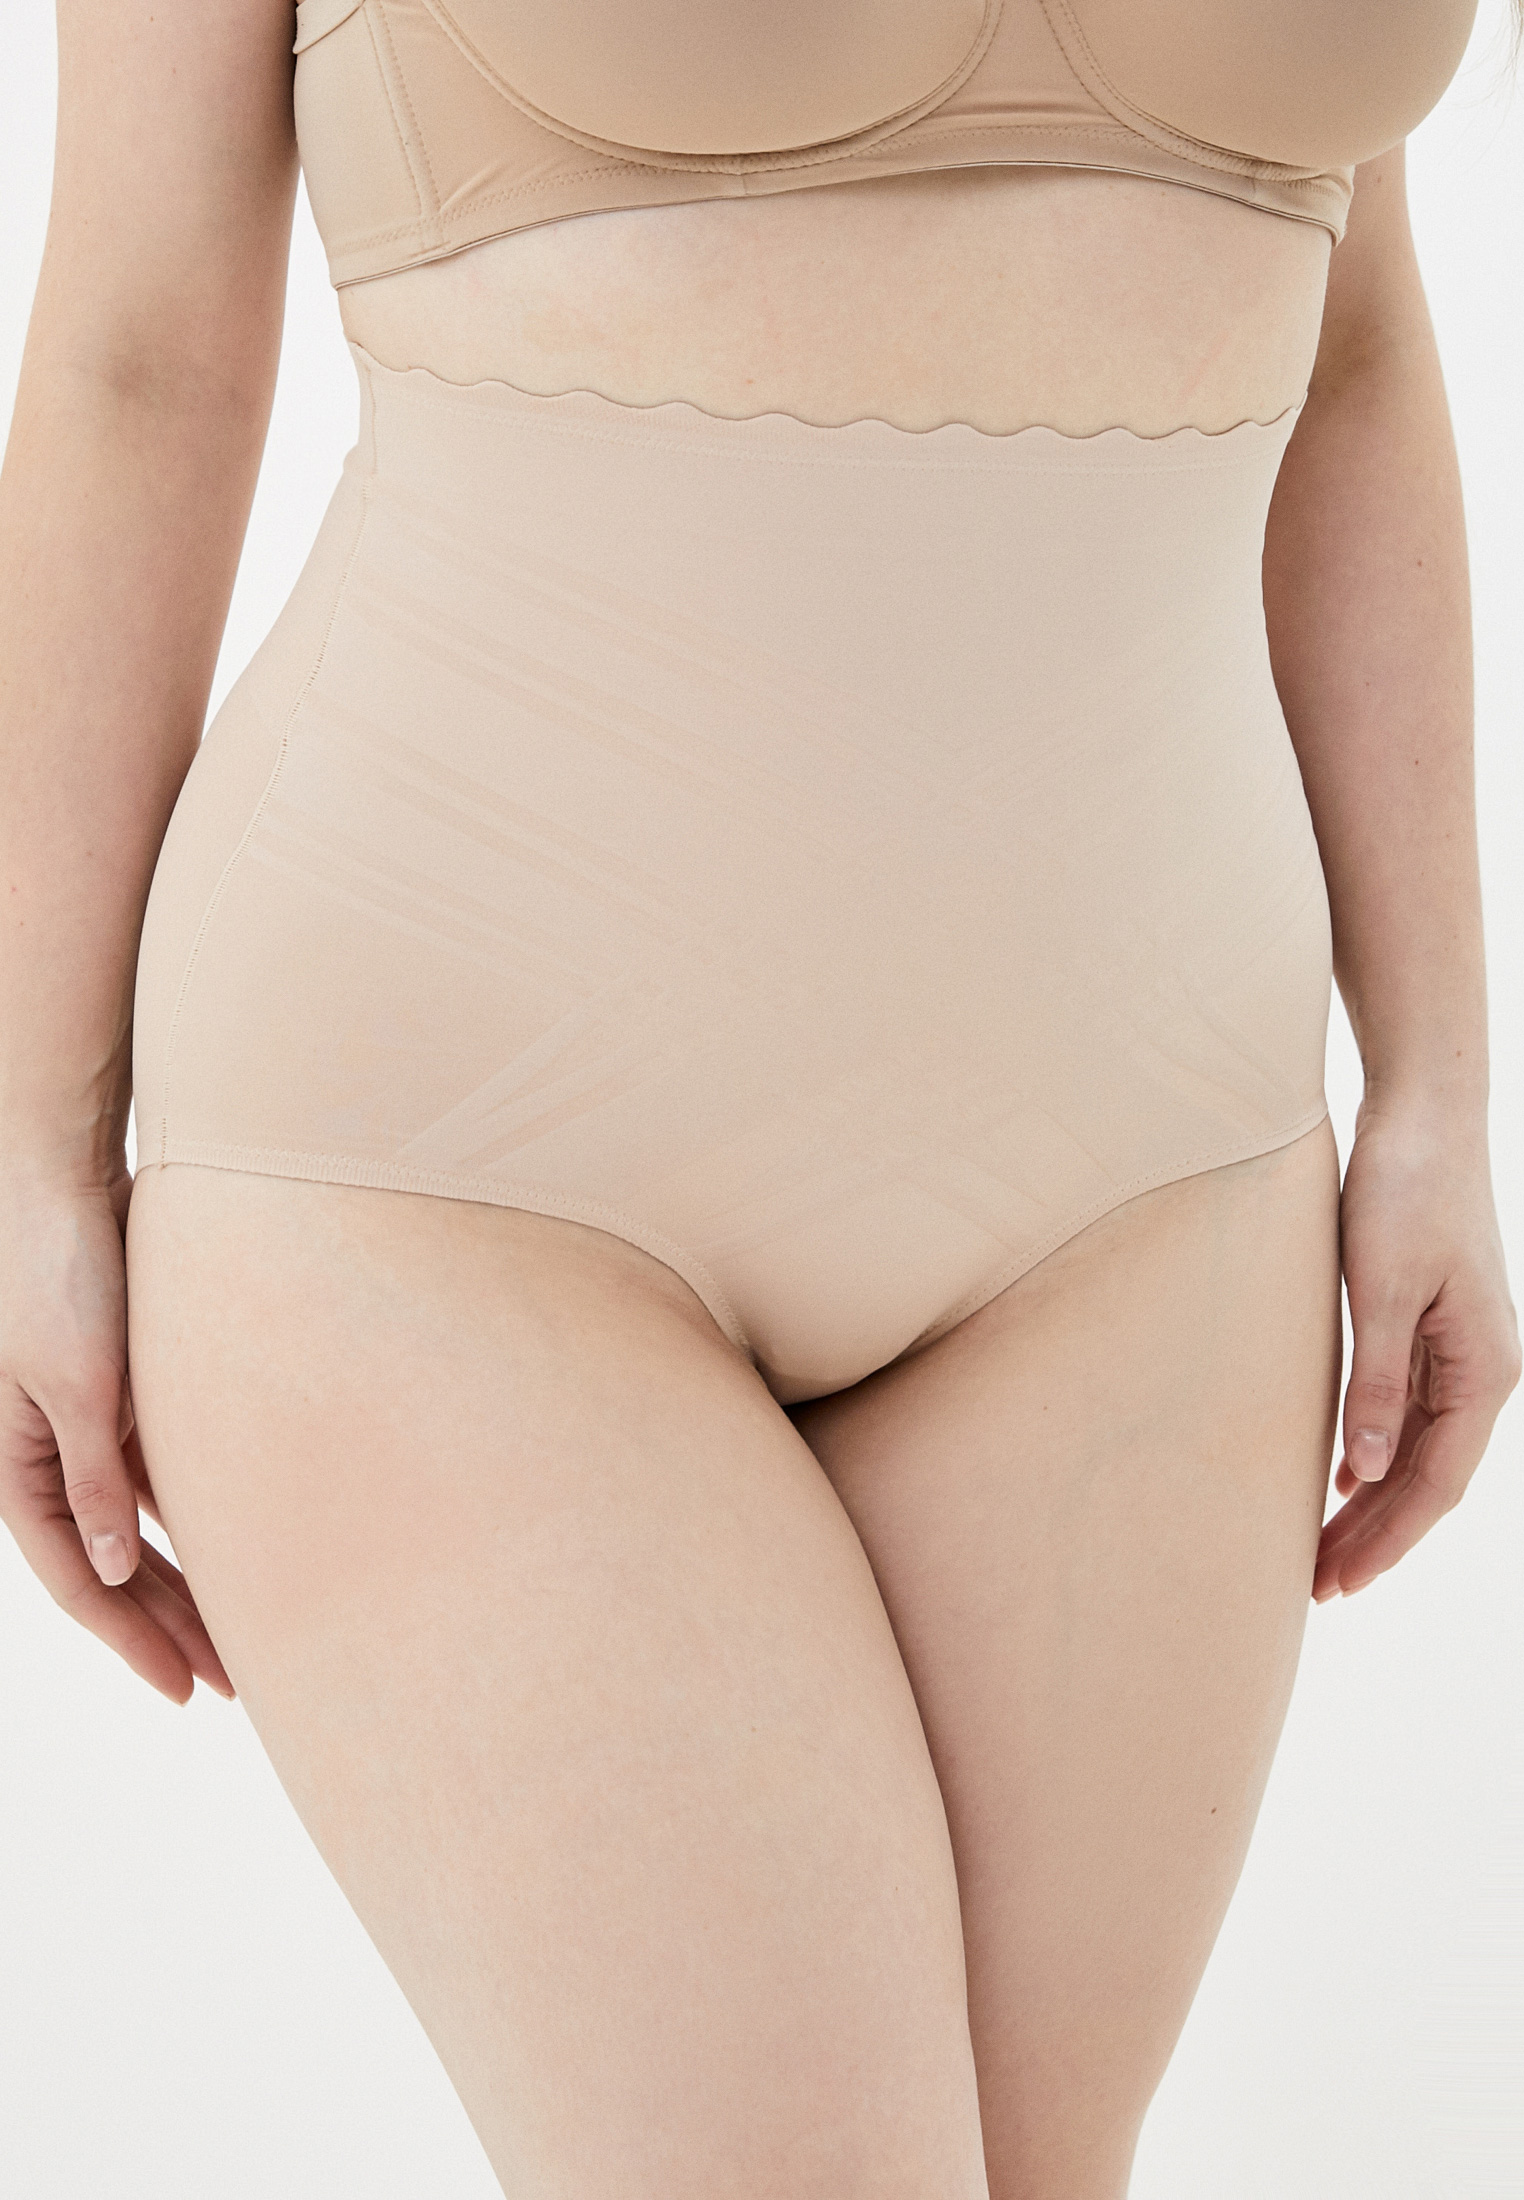 Женское корректирующее белье DIM 4G91